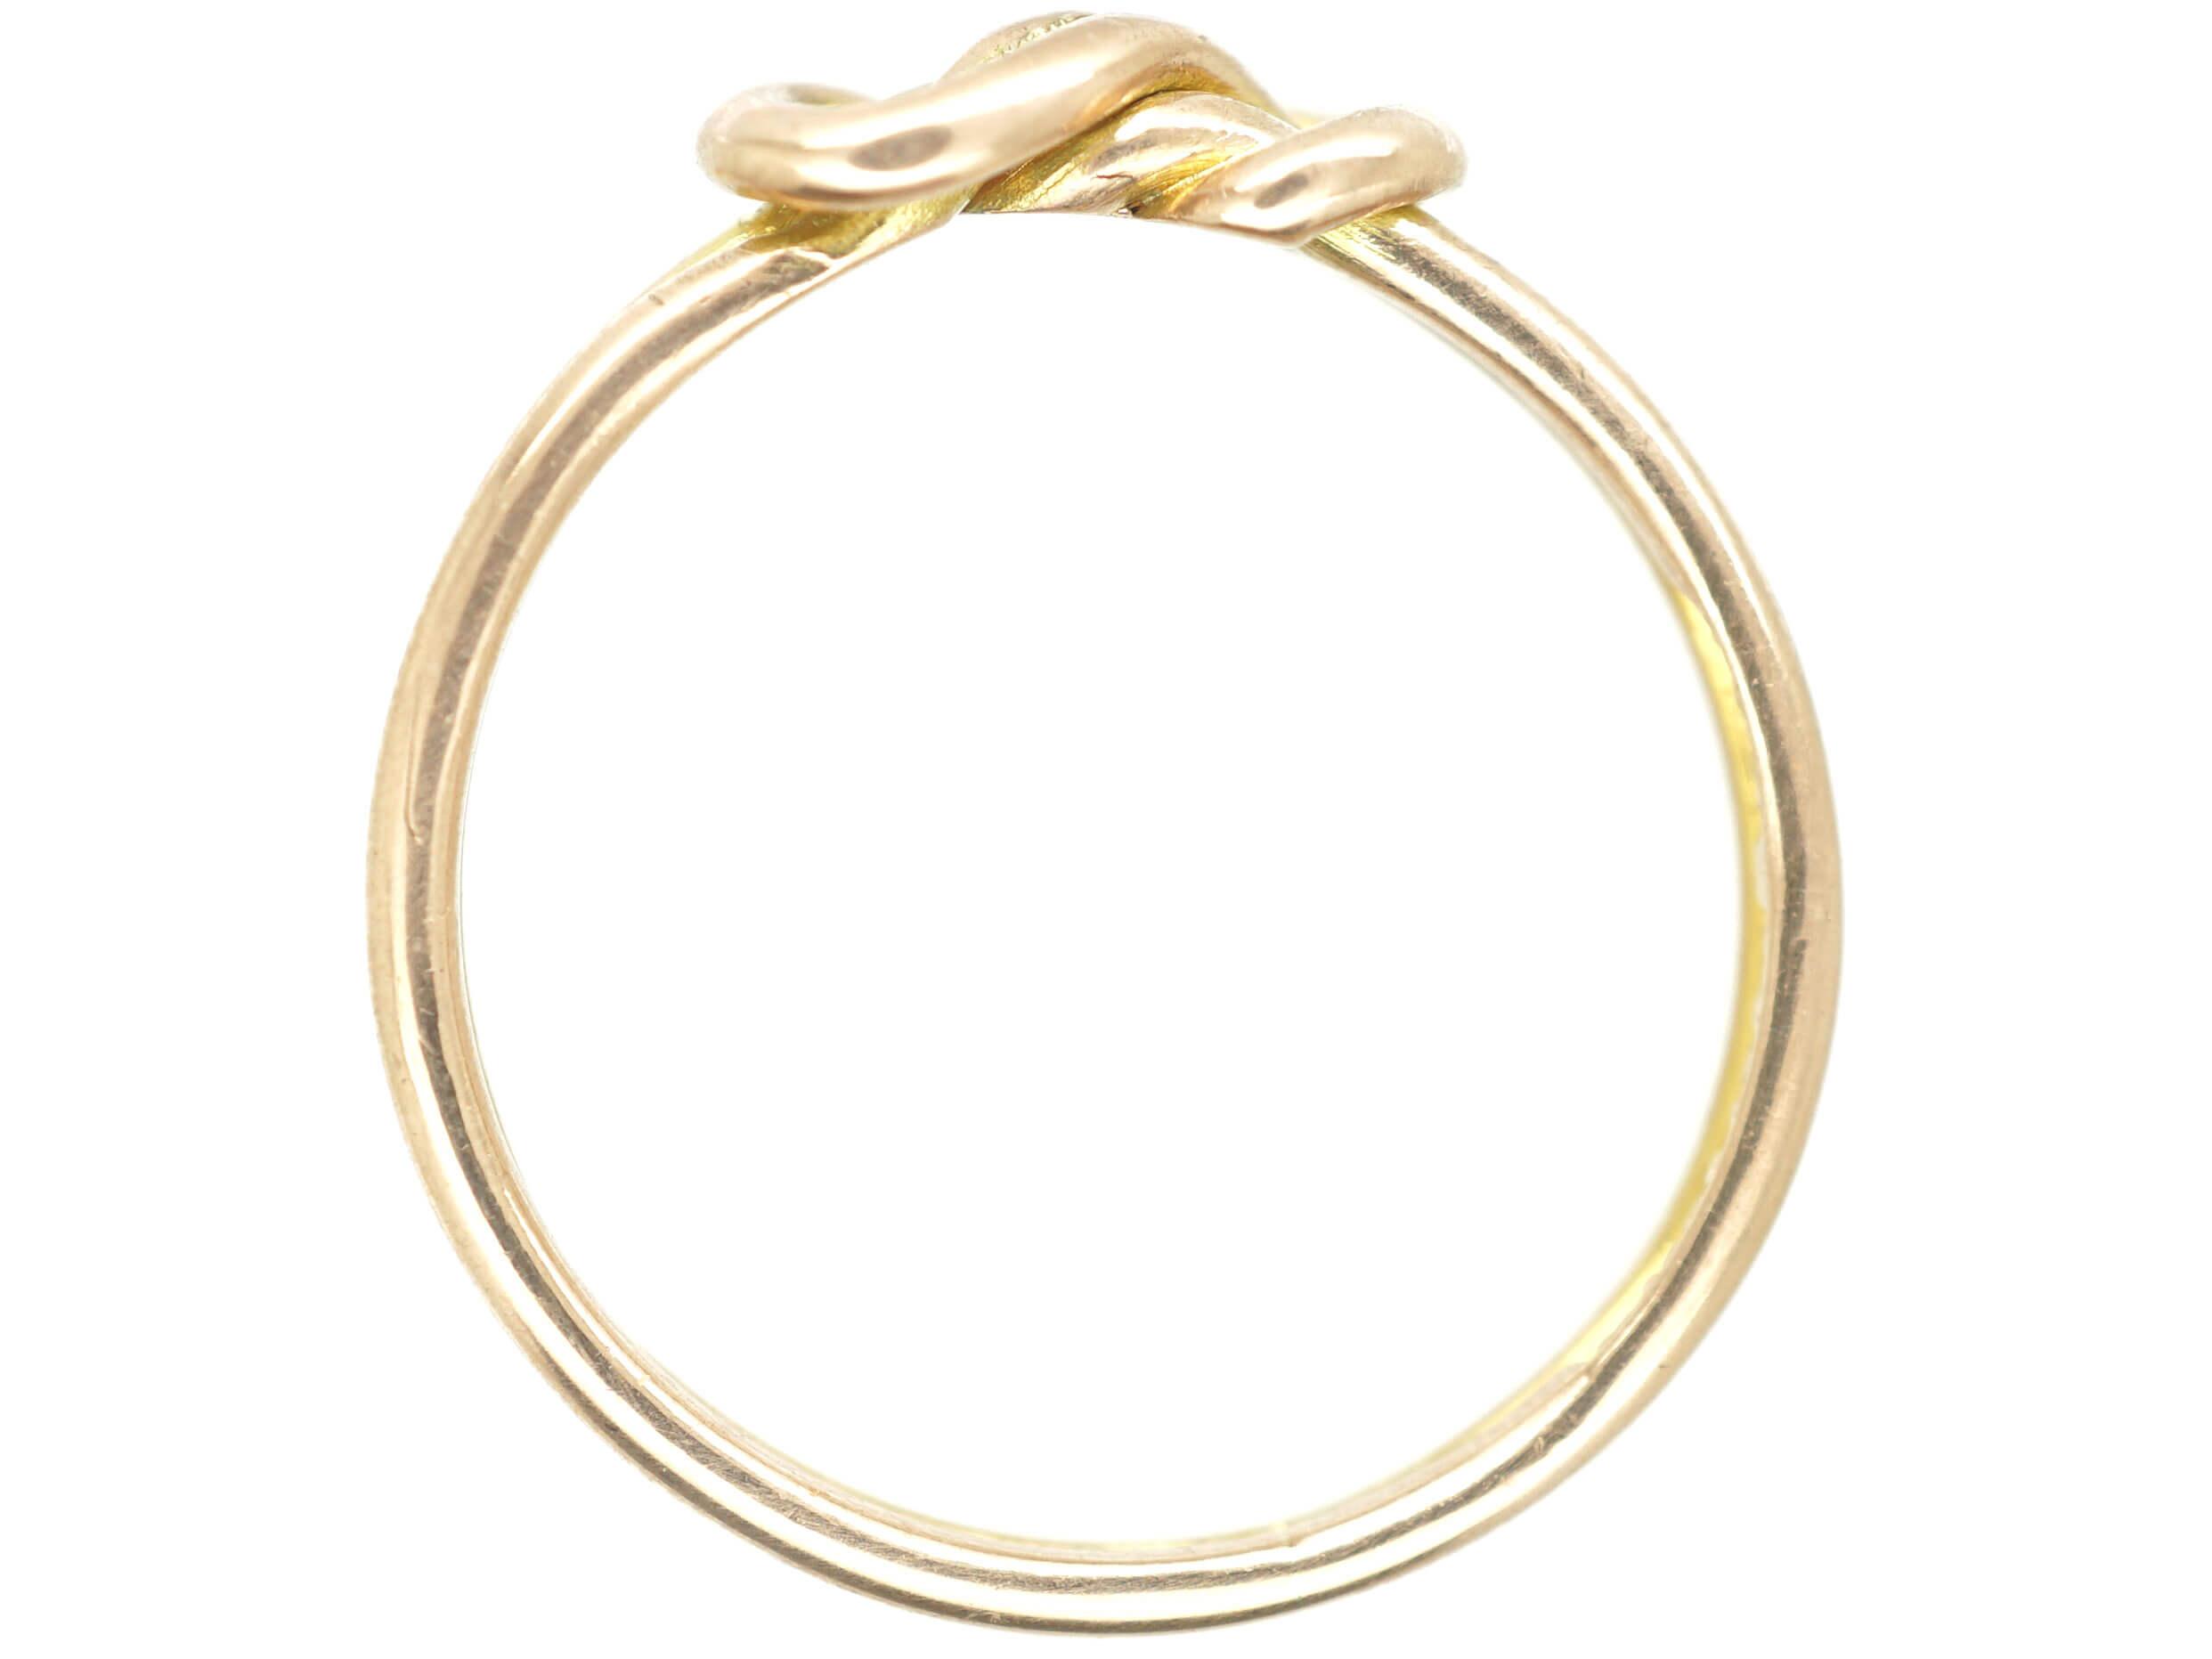 Edwardian 9ct Gold Knot Ring